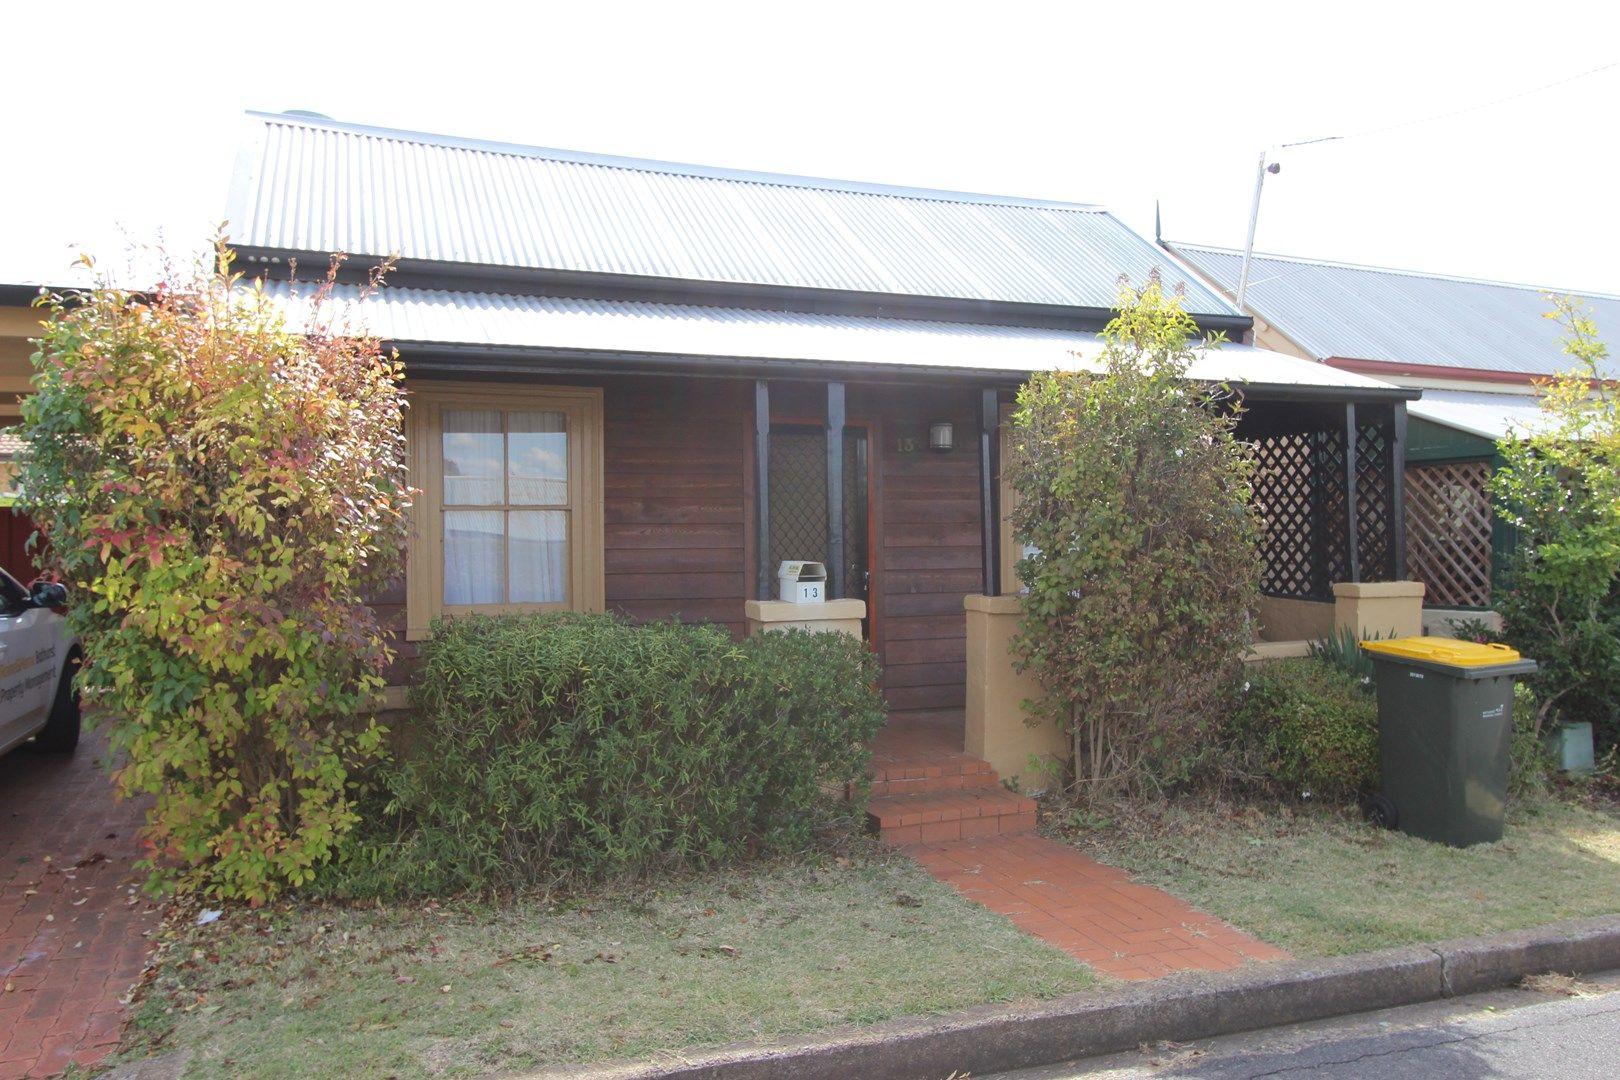 13 Devonshire Lane, Bathurst NSW 2795, Image 0